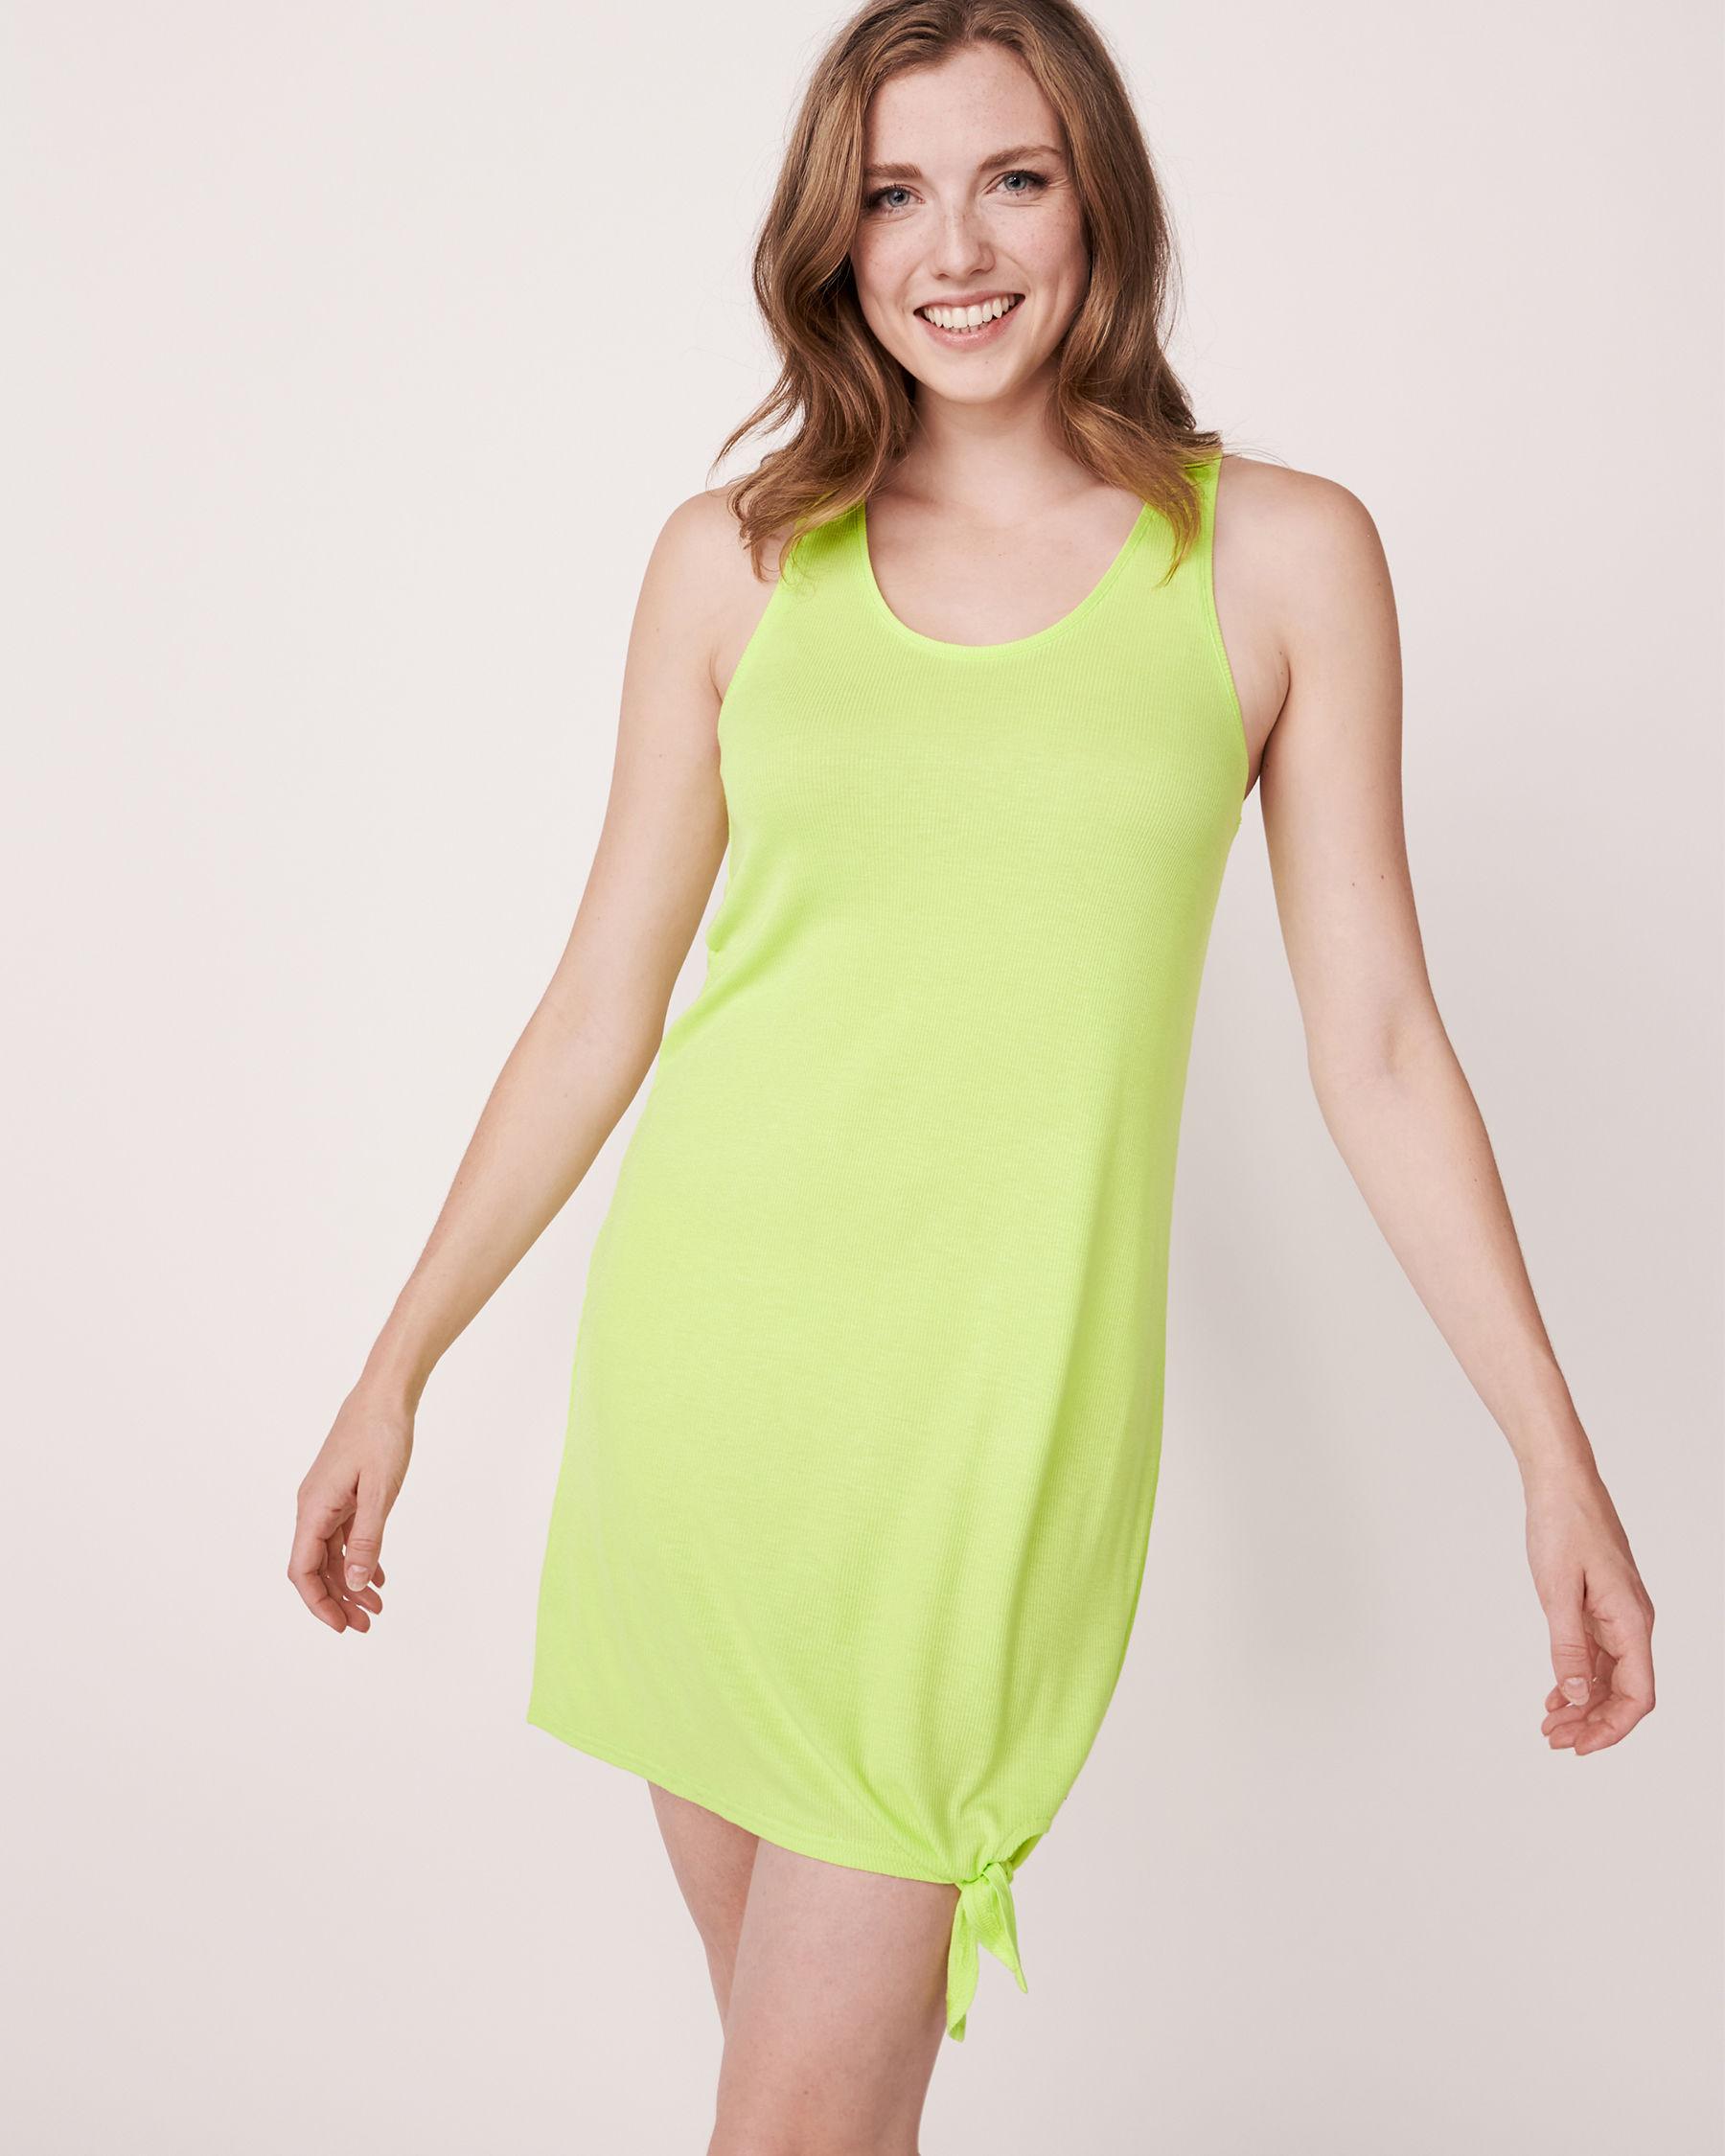 LA VIE EN ROSE AQUA Knotted Sleeveless Dress Lime 80400002 - View3